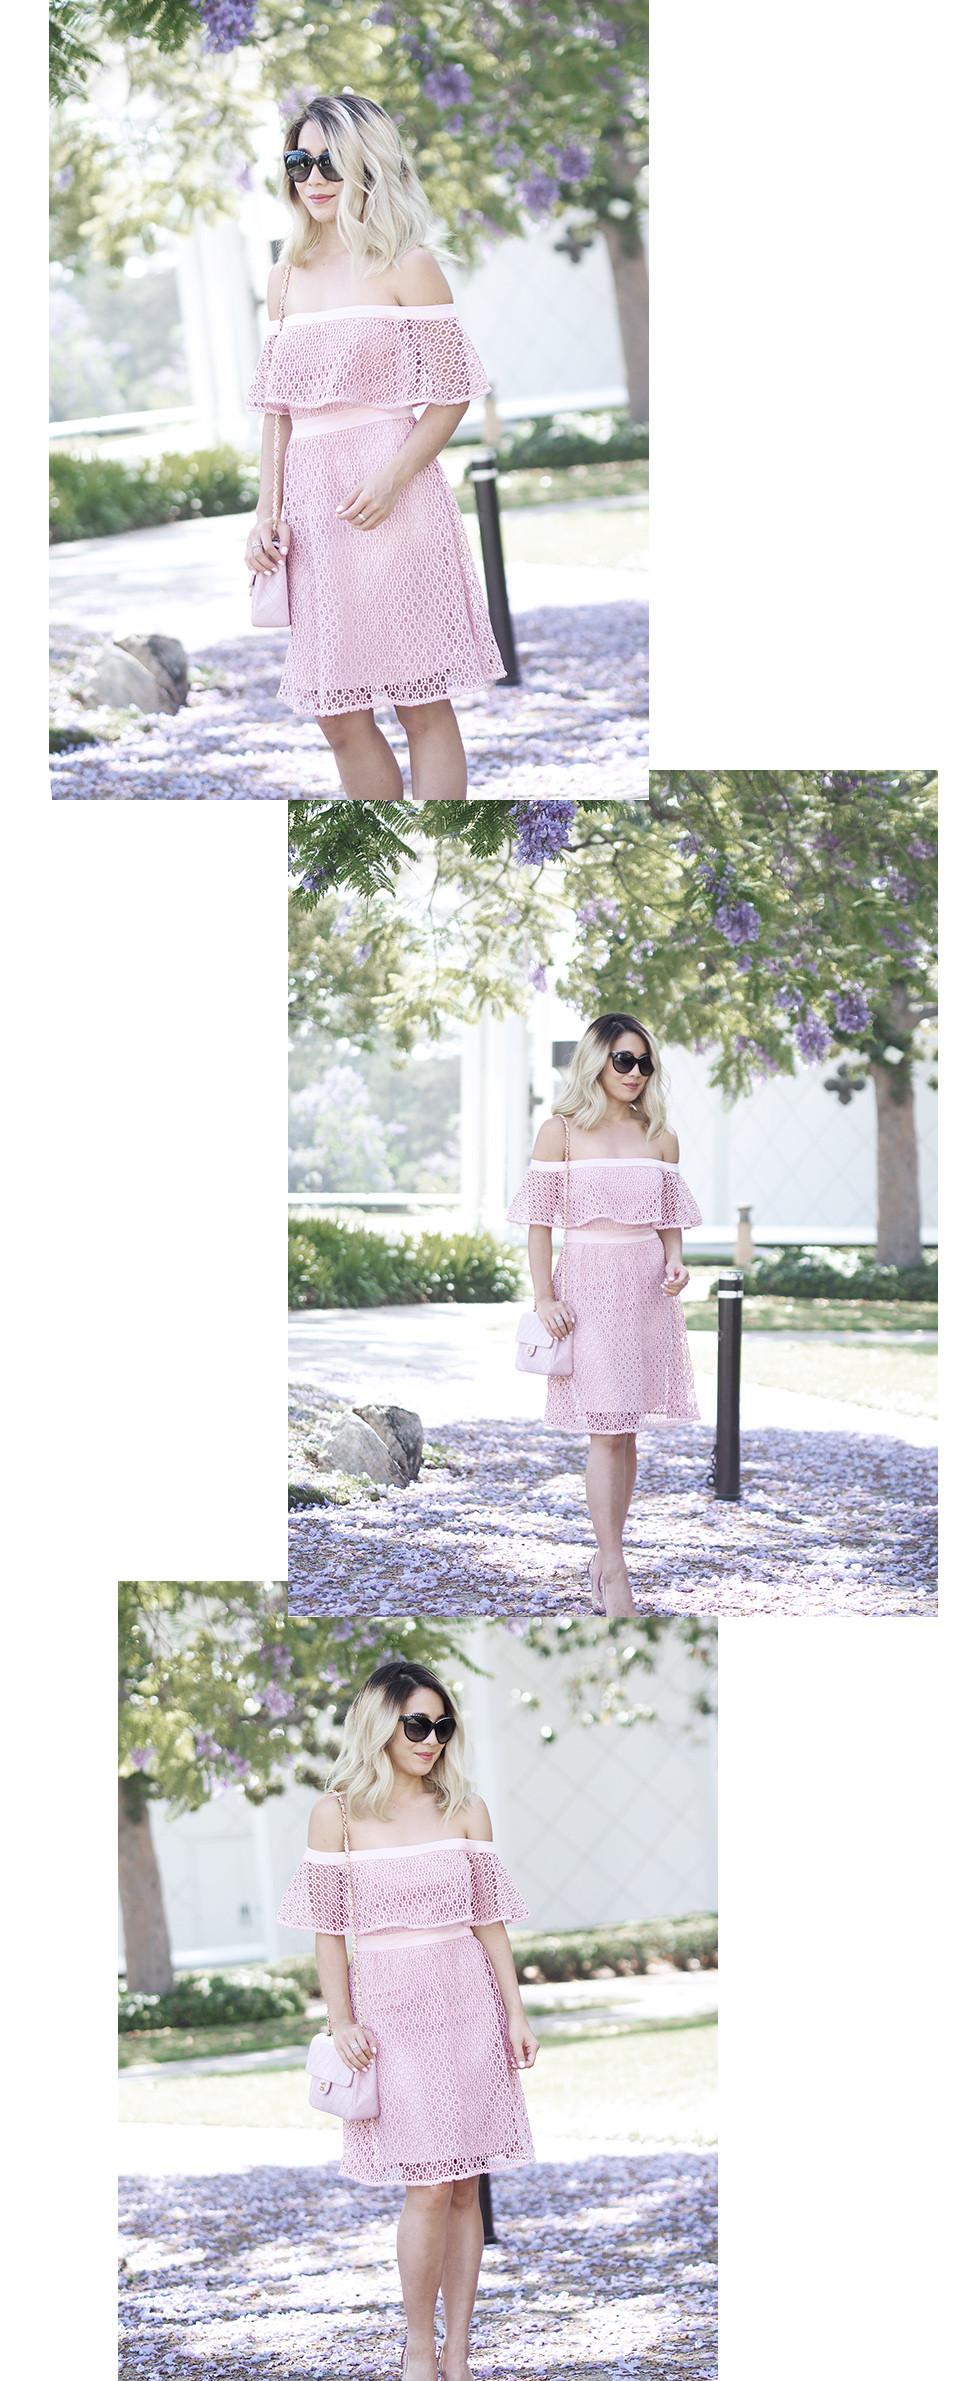 Bardot Pink Lace Dress   Lam in Louboutins